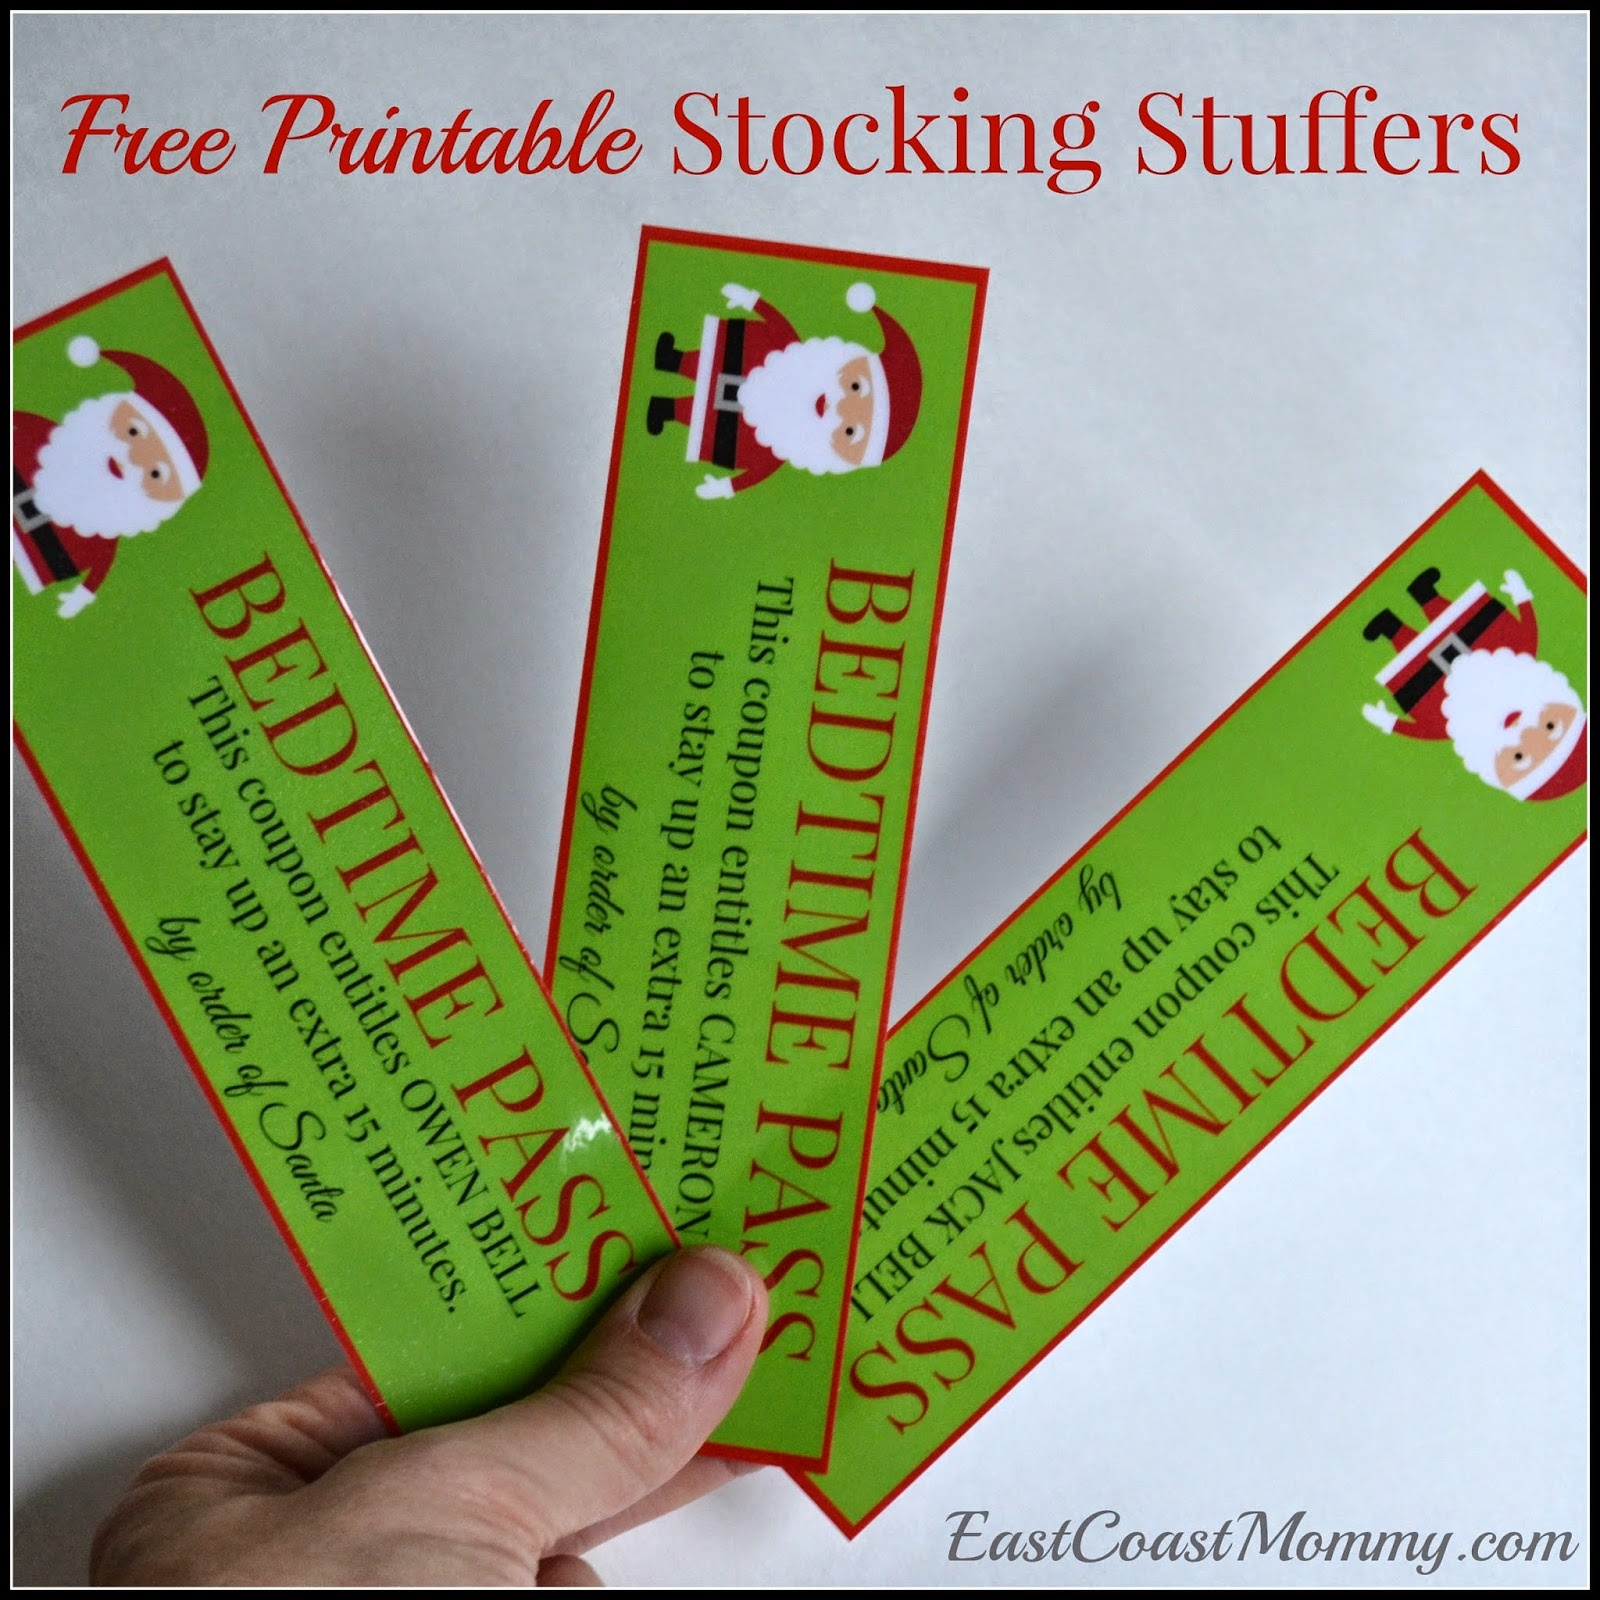 East Coast Mommy: Stocking Stuffer Coupons {Free Printable} - Free Printable Stocking Stuffers